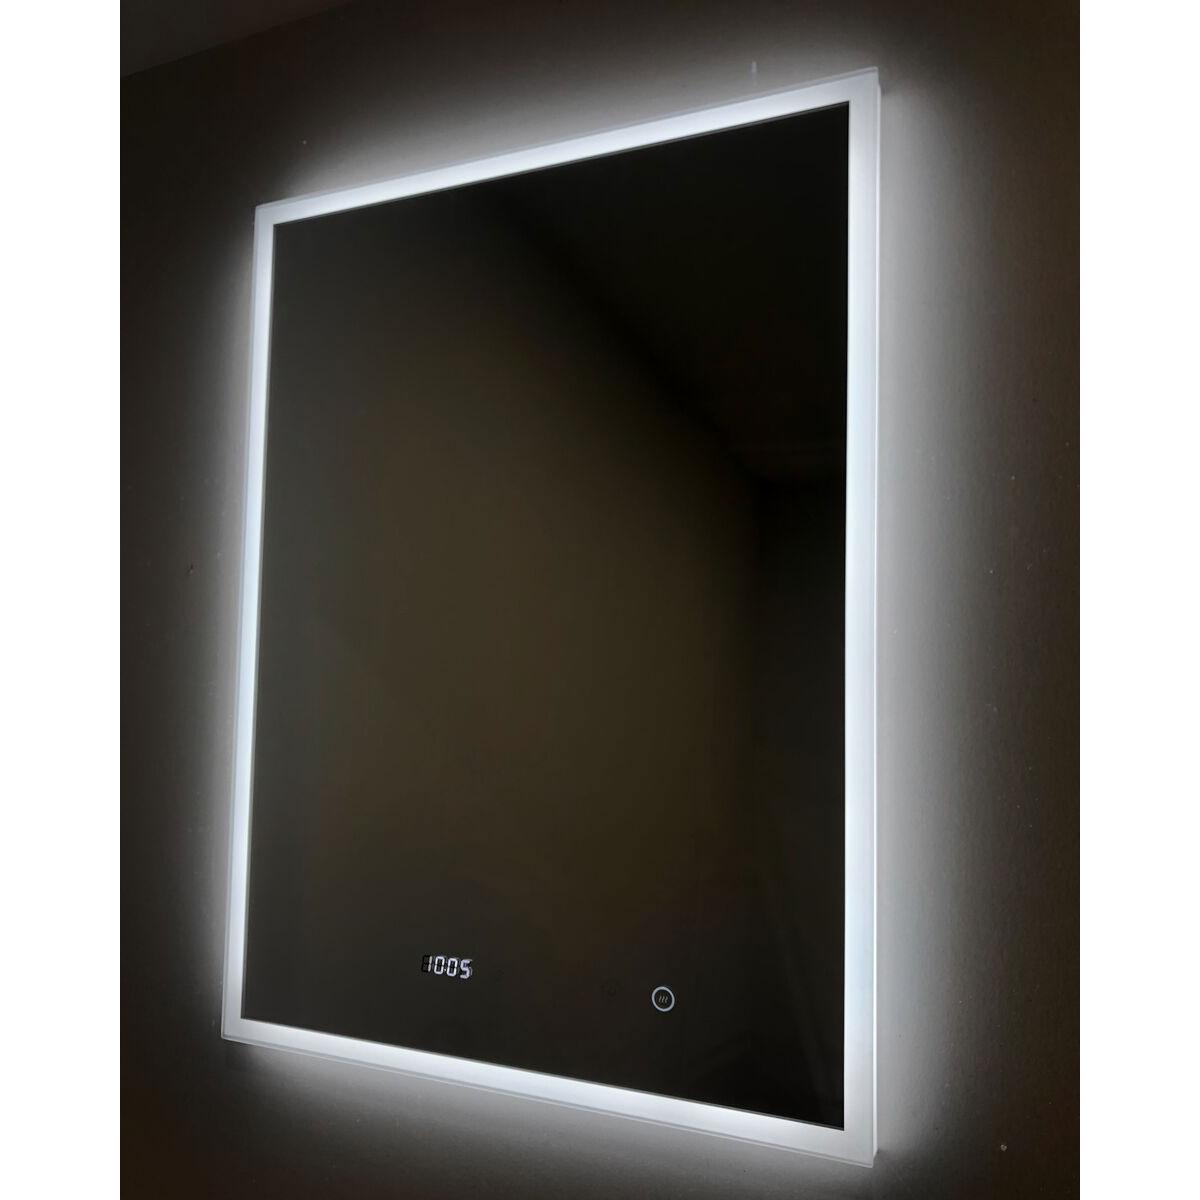 Venus deluxe led backlit mirror digital clock 60cm x 80 cm for Mirror 60cm wide